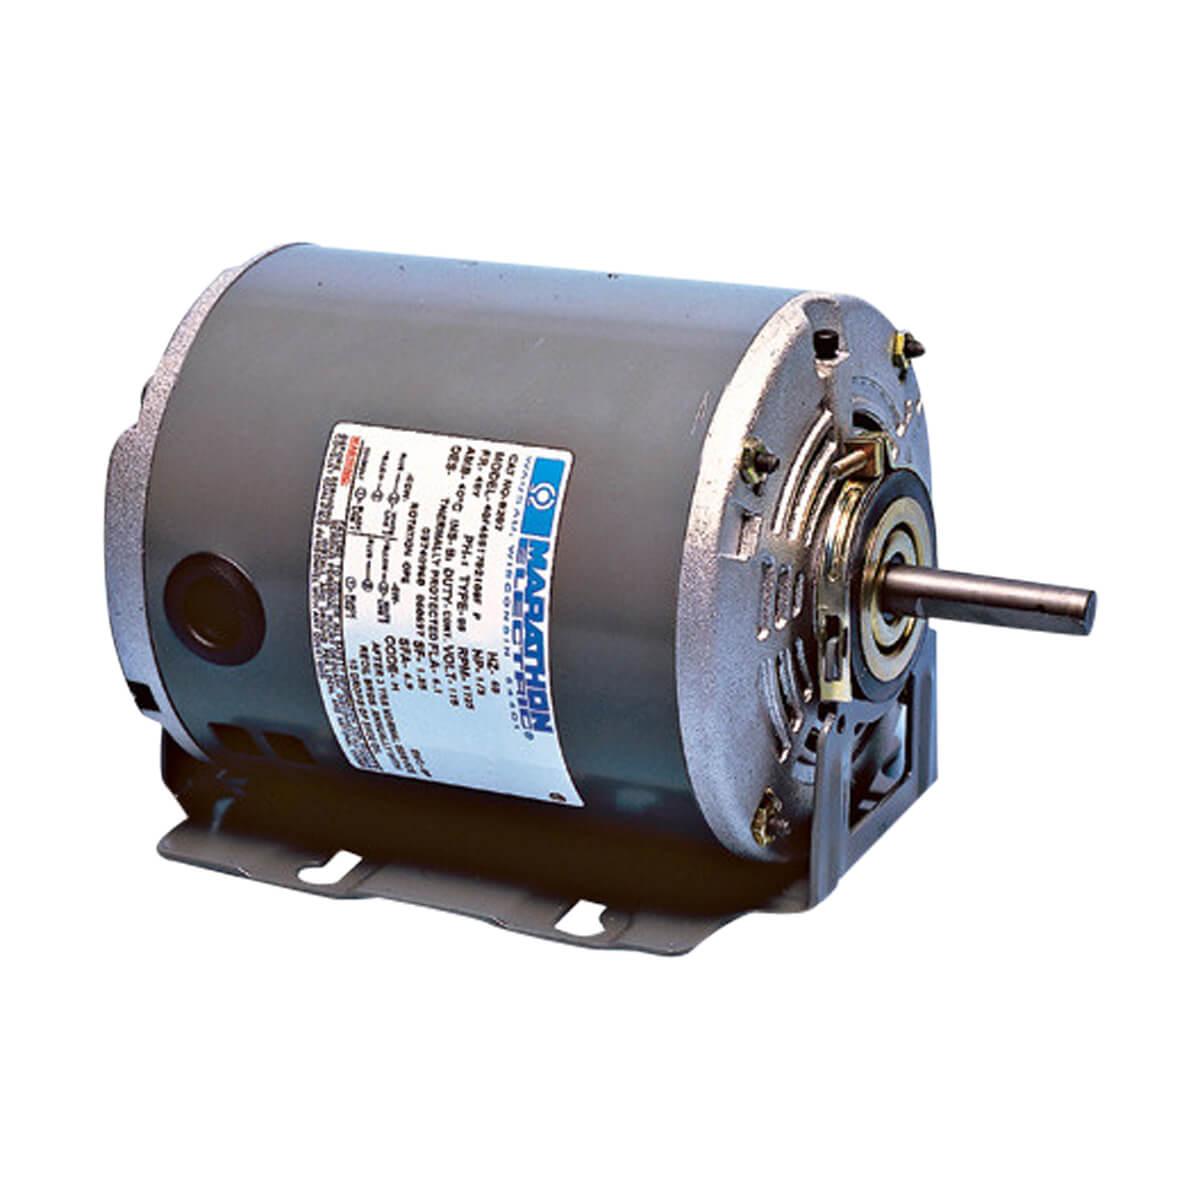 Furnace Motor - B206 (1/4 hp)